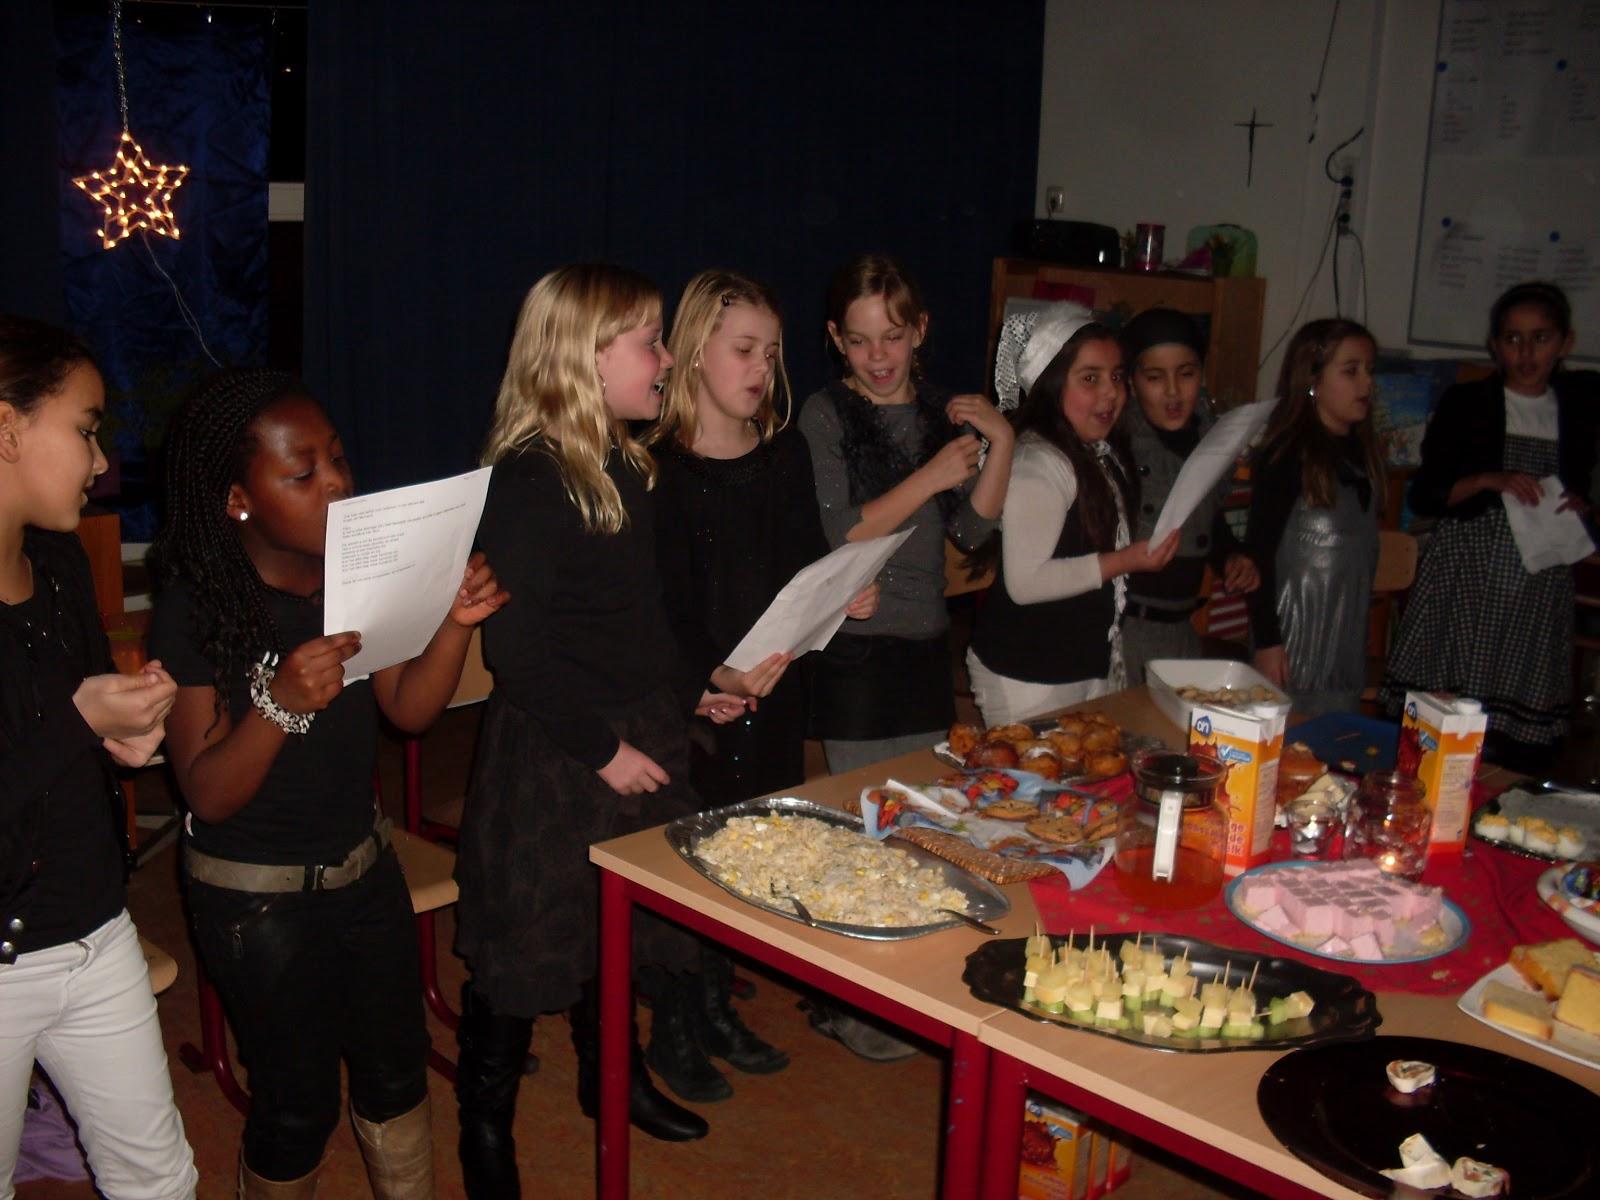 Dagblog groep 5: december 2011